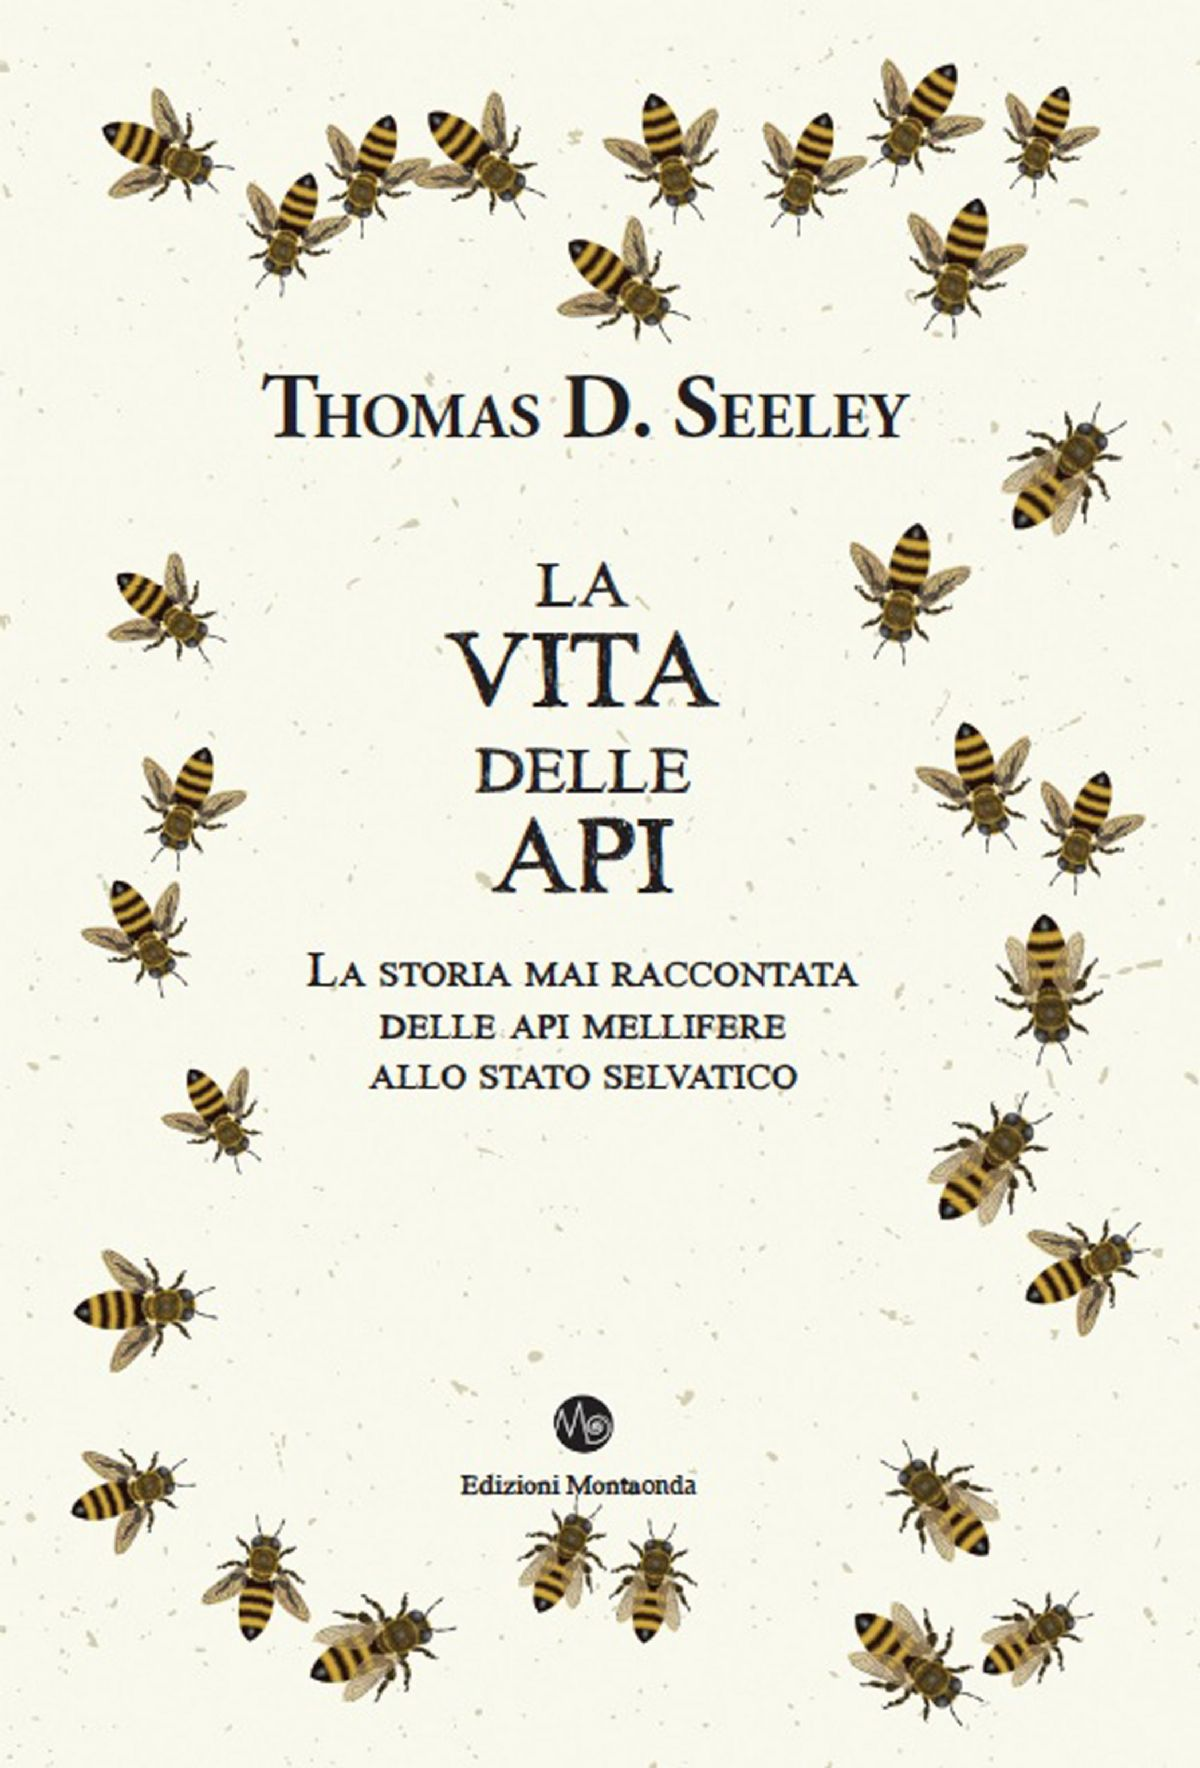 Thomas D. Seeley – La vita delle api